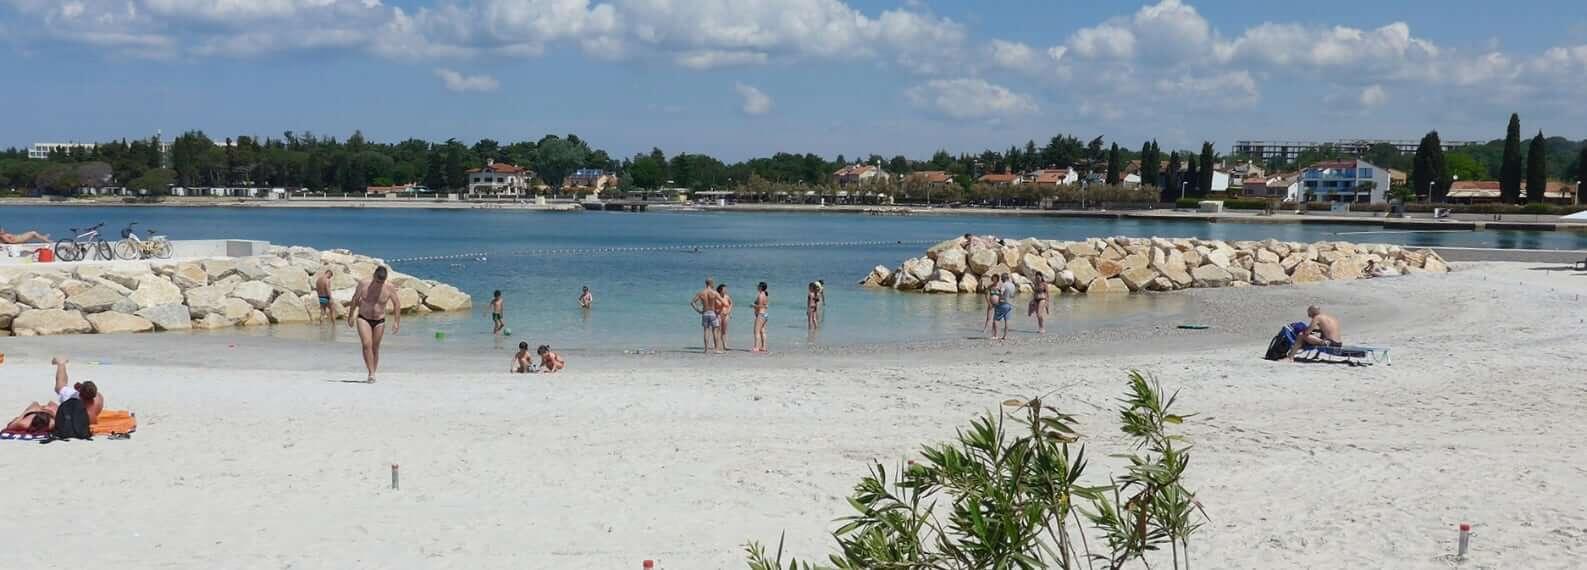 Porec Istrian Kroatien Strand